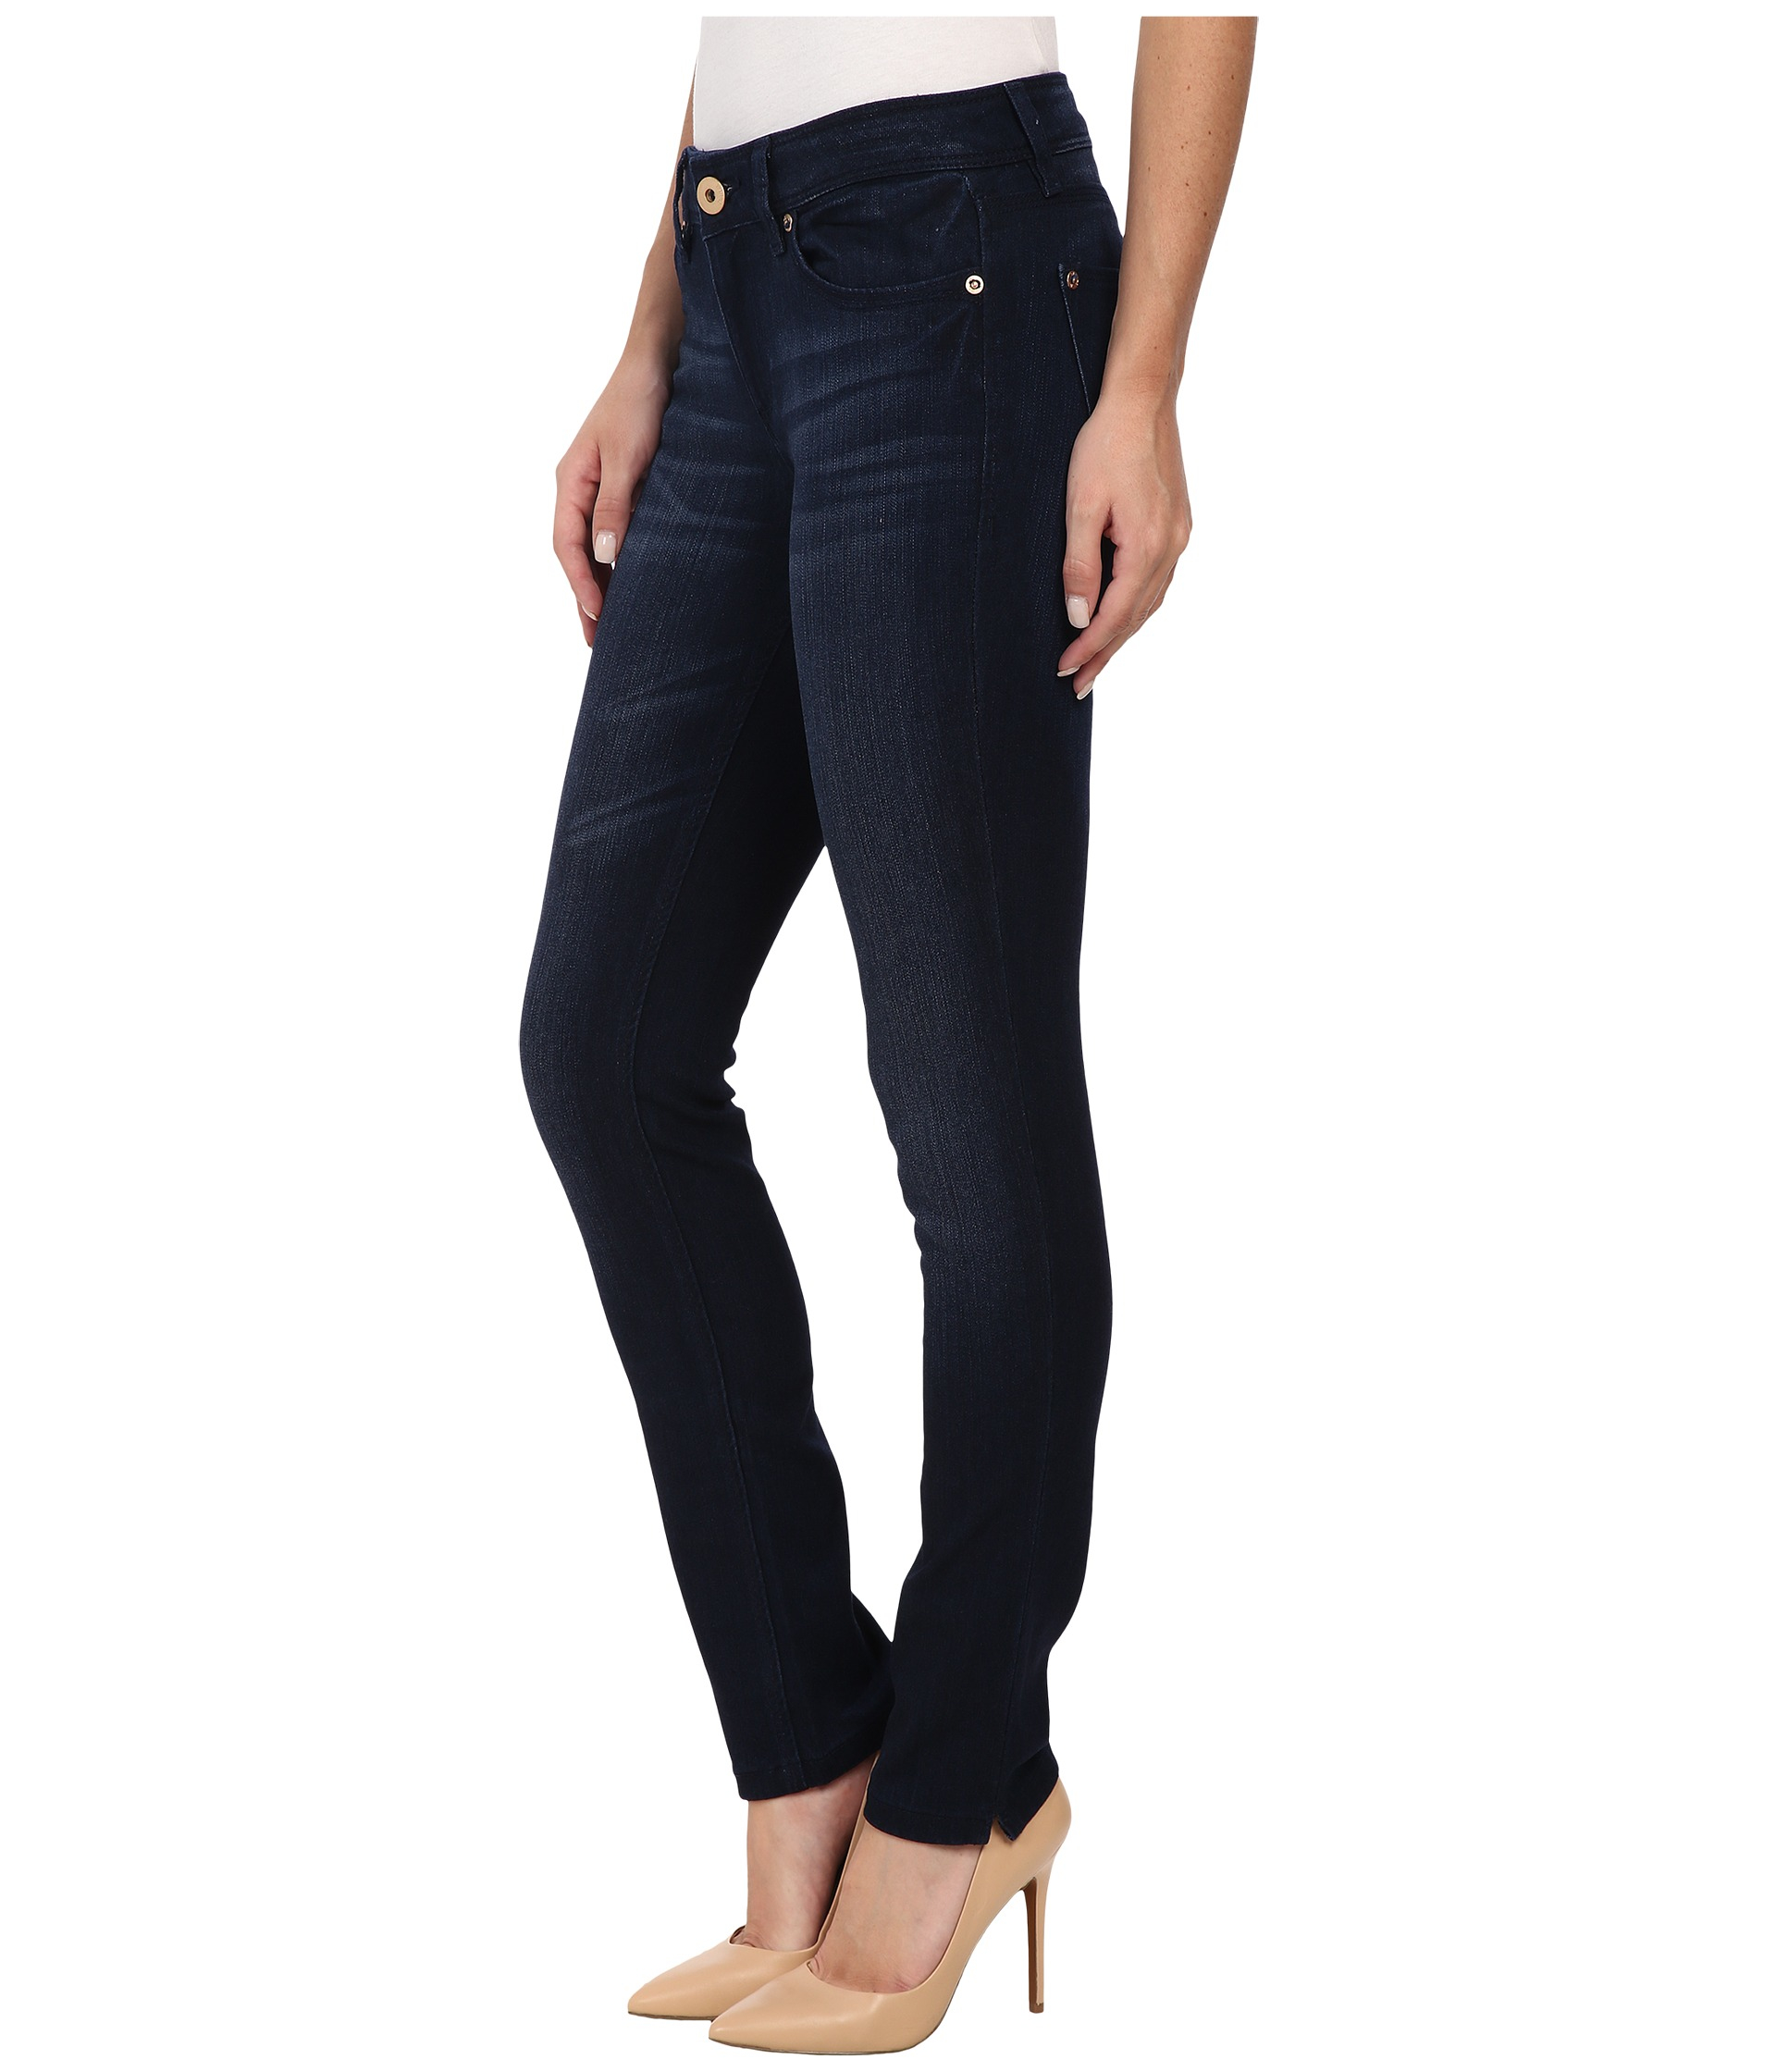 dl1961 angel skinny jeans in berlin in blue berlin lyst. Black Bedroom Furniture Sets. Home Design Ideas